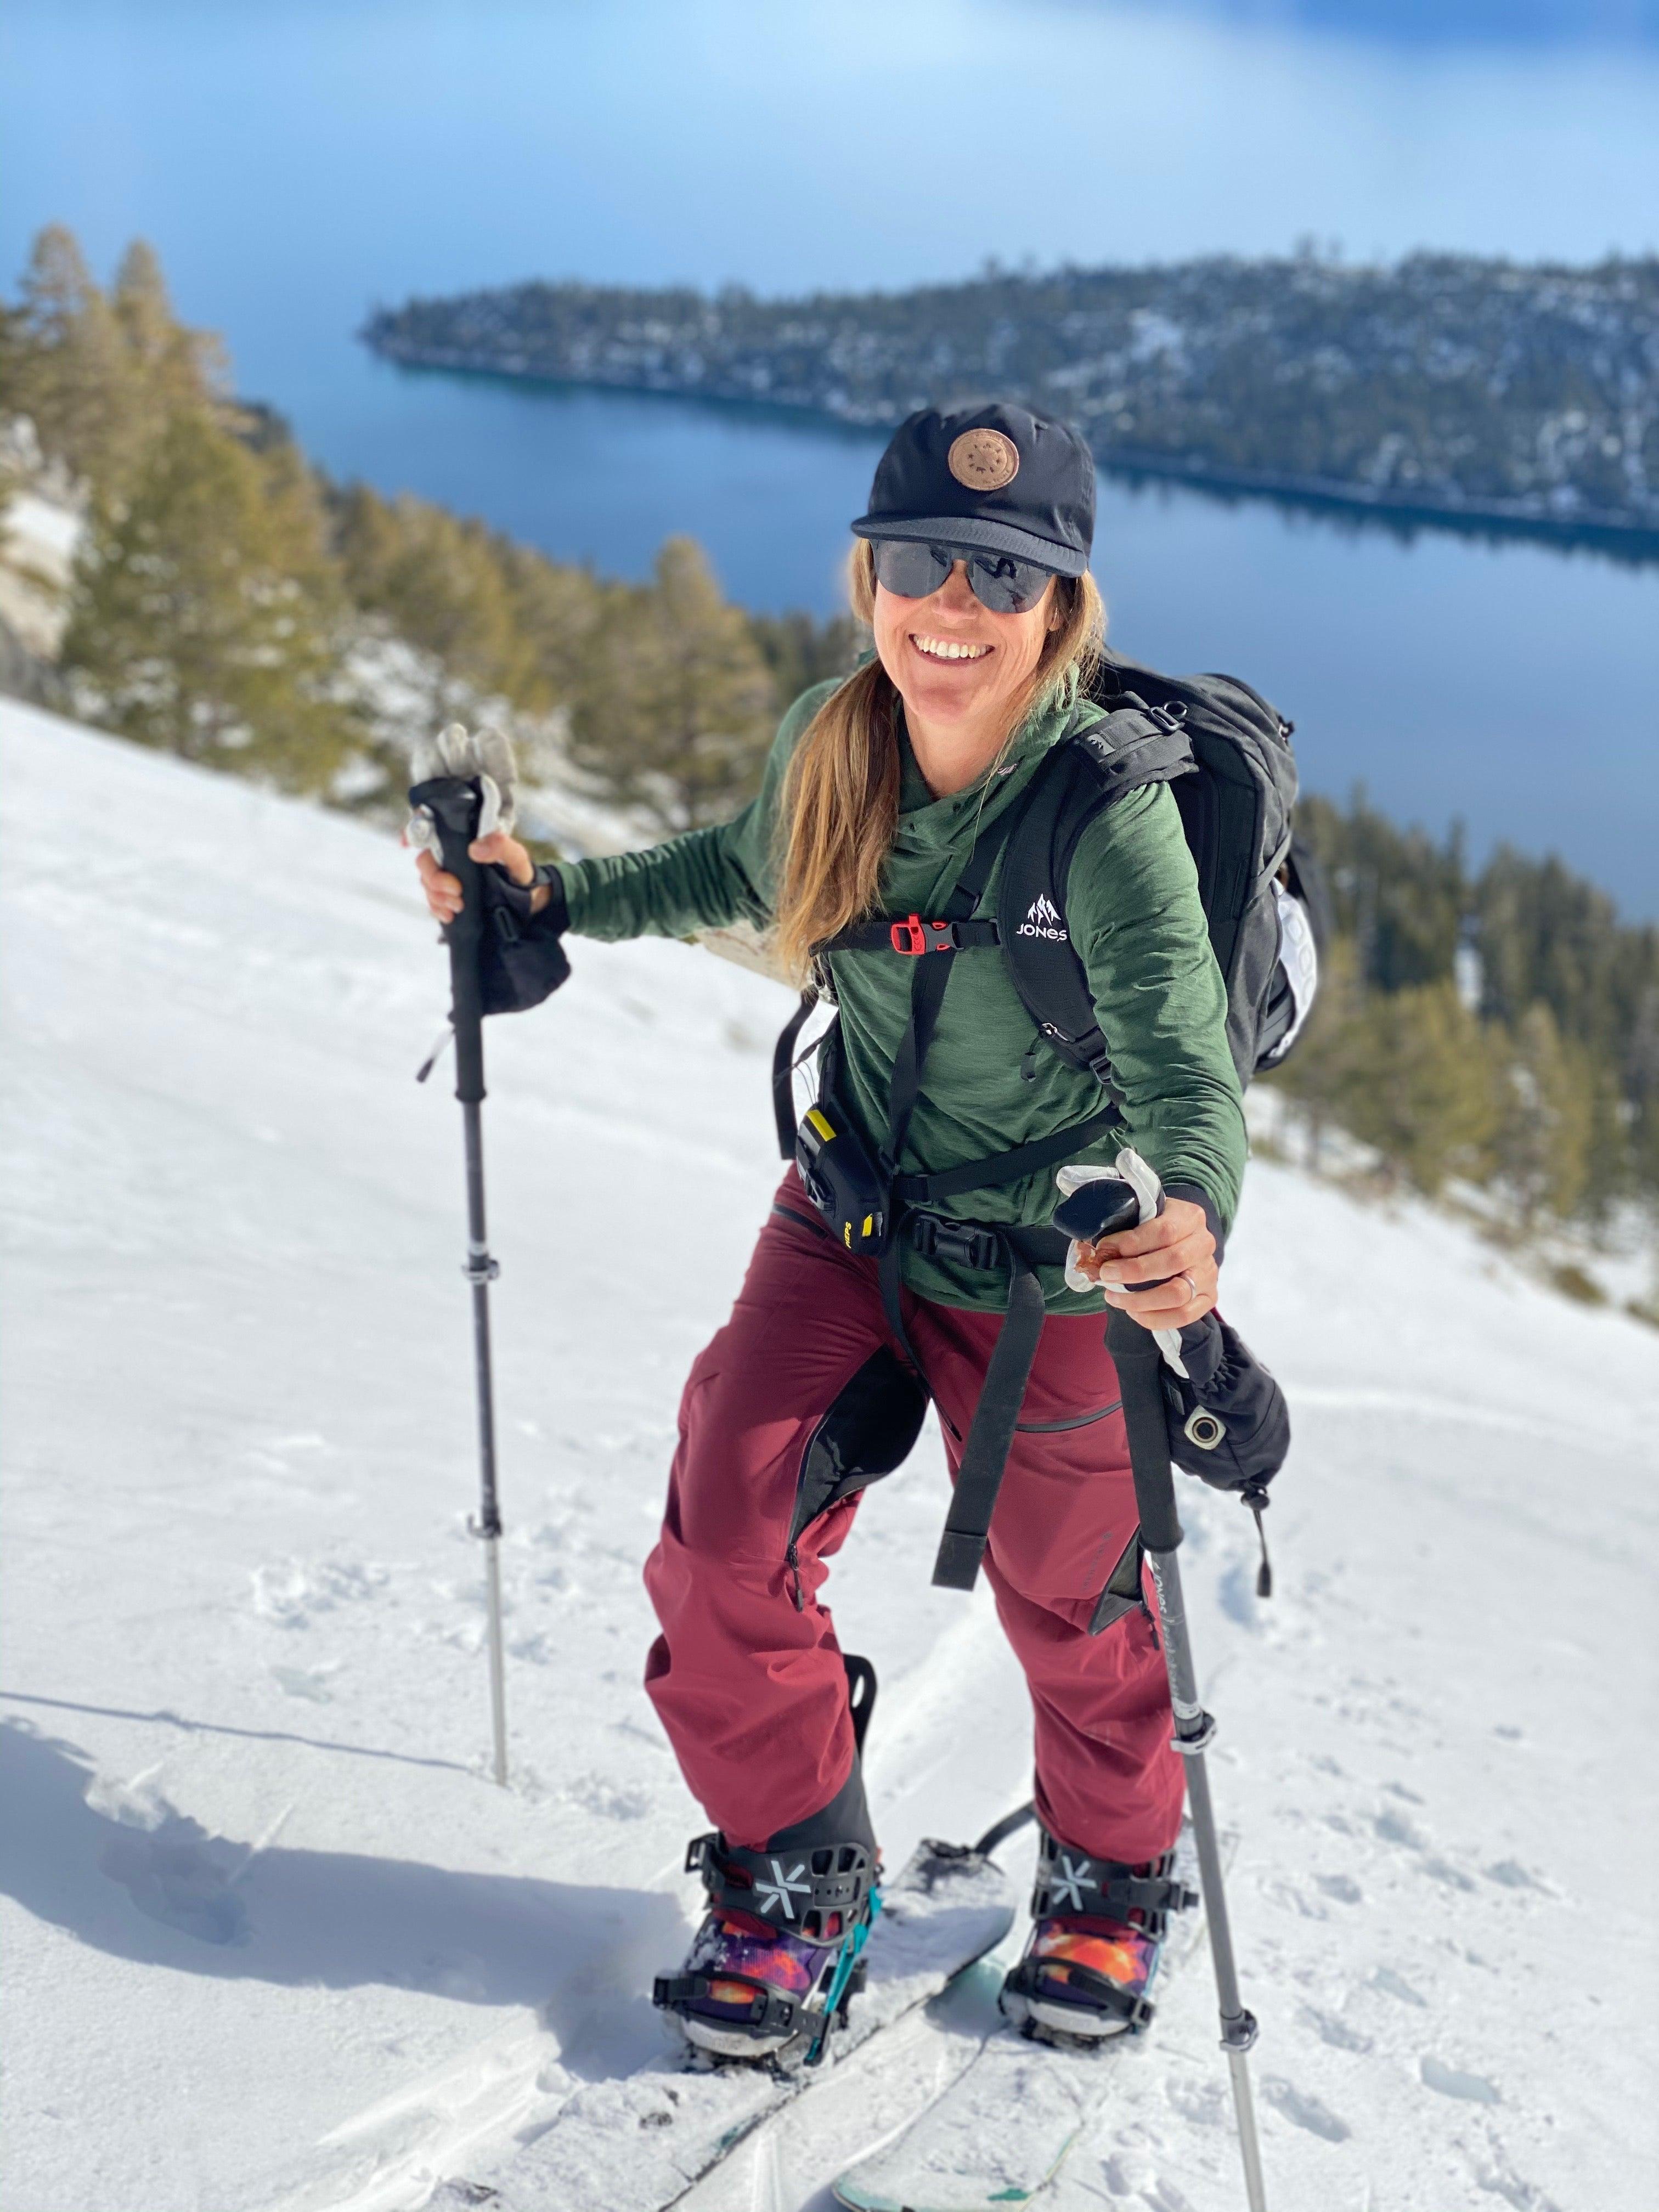 Snowy Mountain Inct Logo All Over T Shirt Tee Winter Snowboard Ski Fashion Men